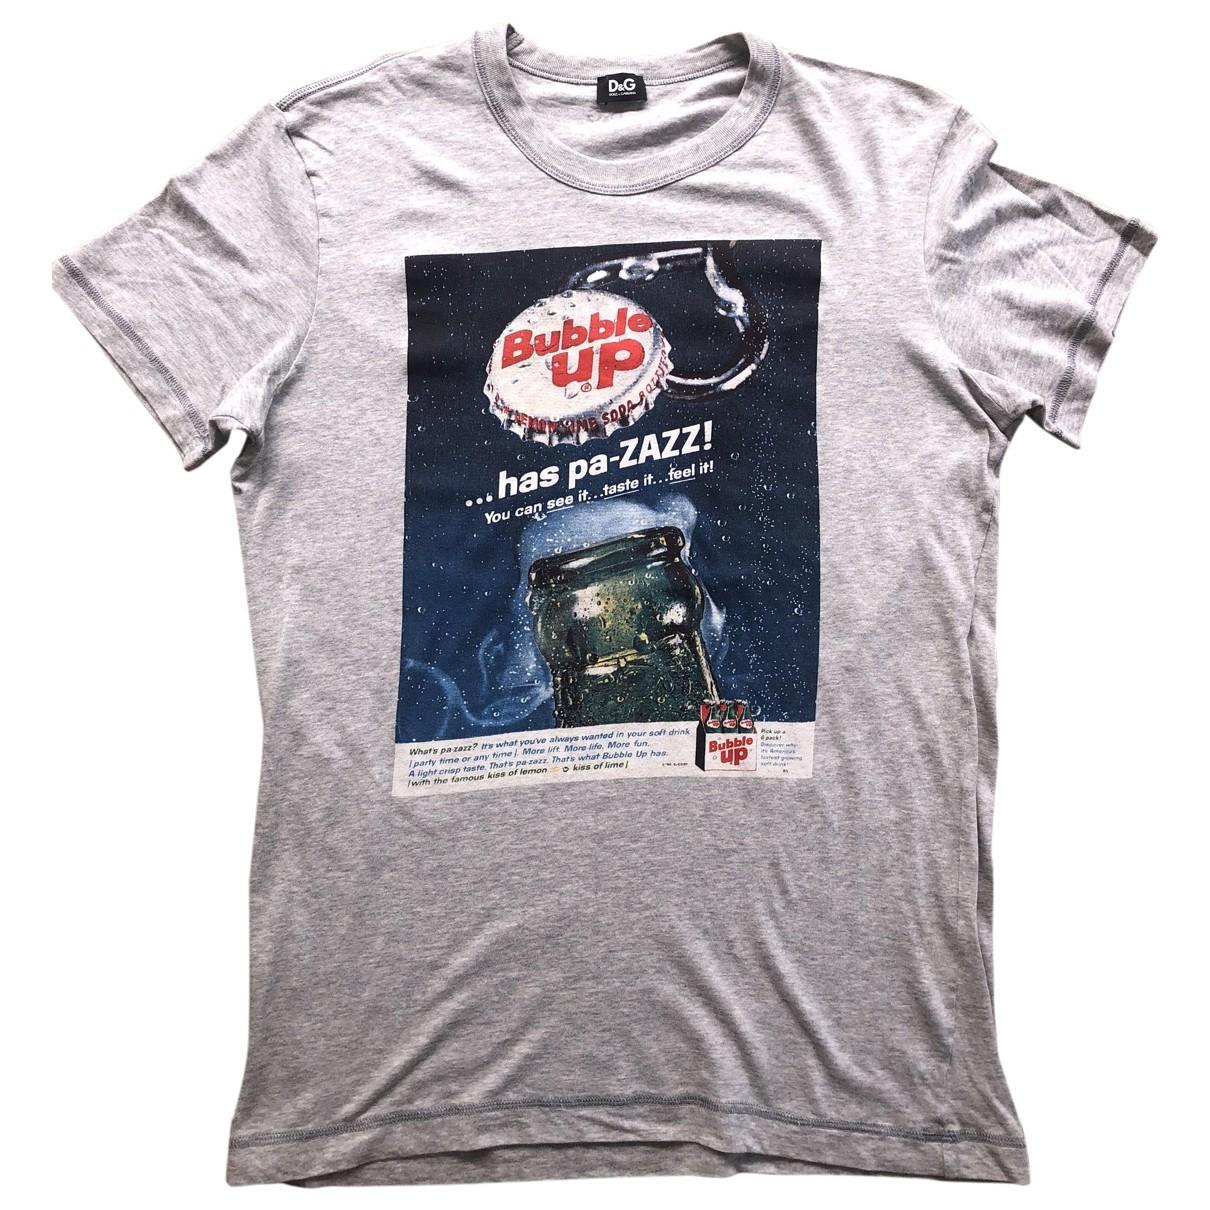 D&g \N T-Shirts in  Grau Baumwolle